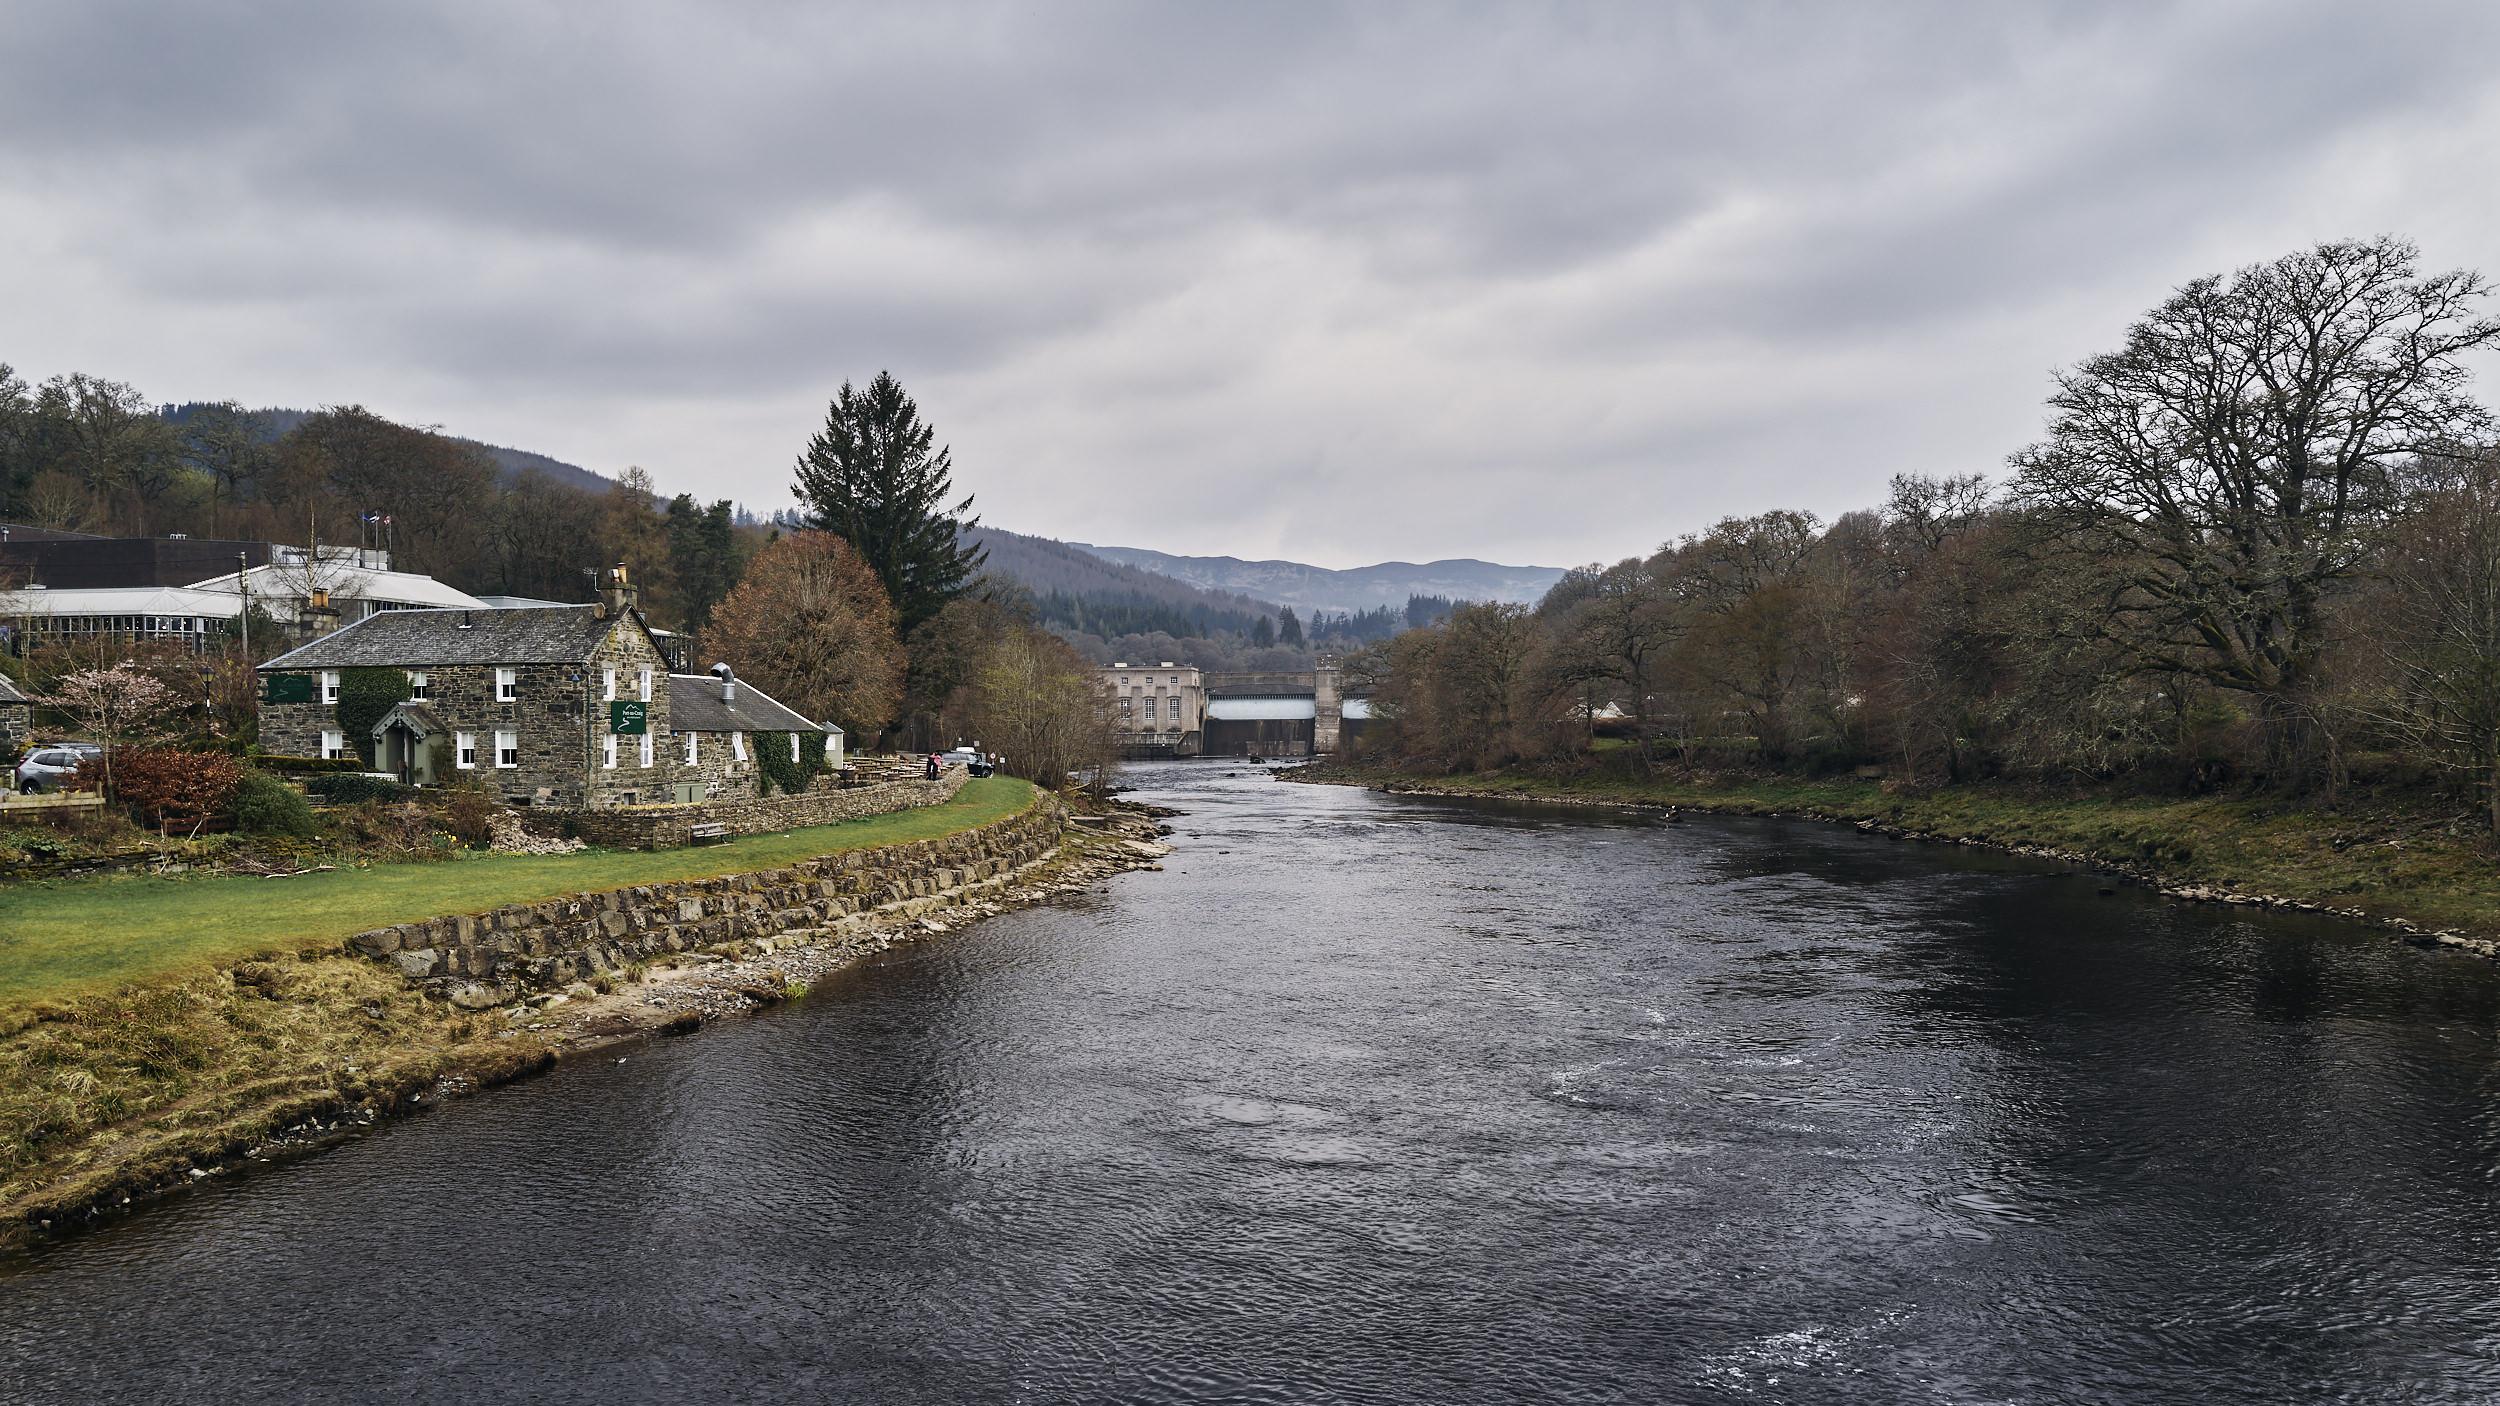 2019 04 14 - Scotland 2019 Q2 70.jpg